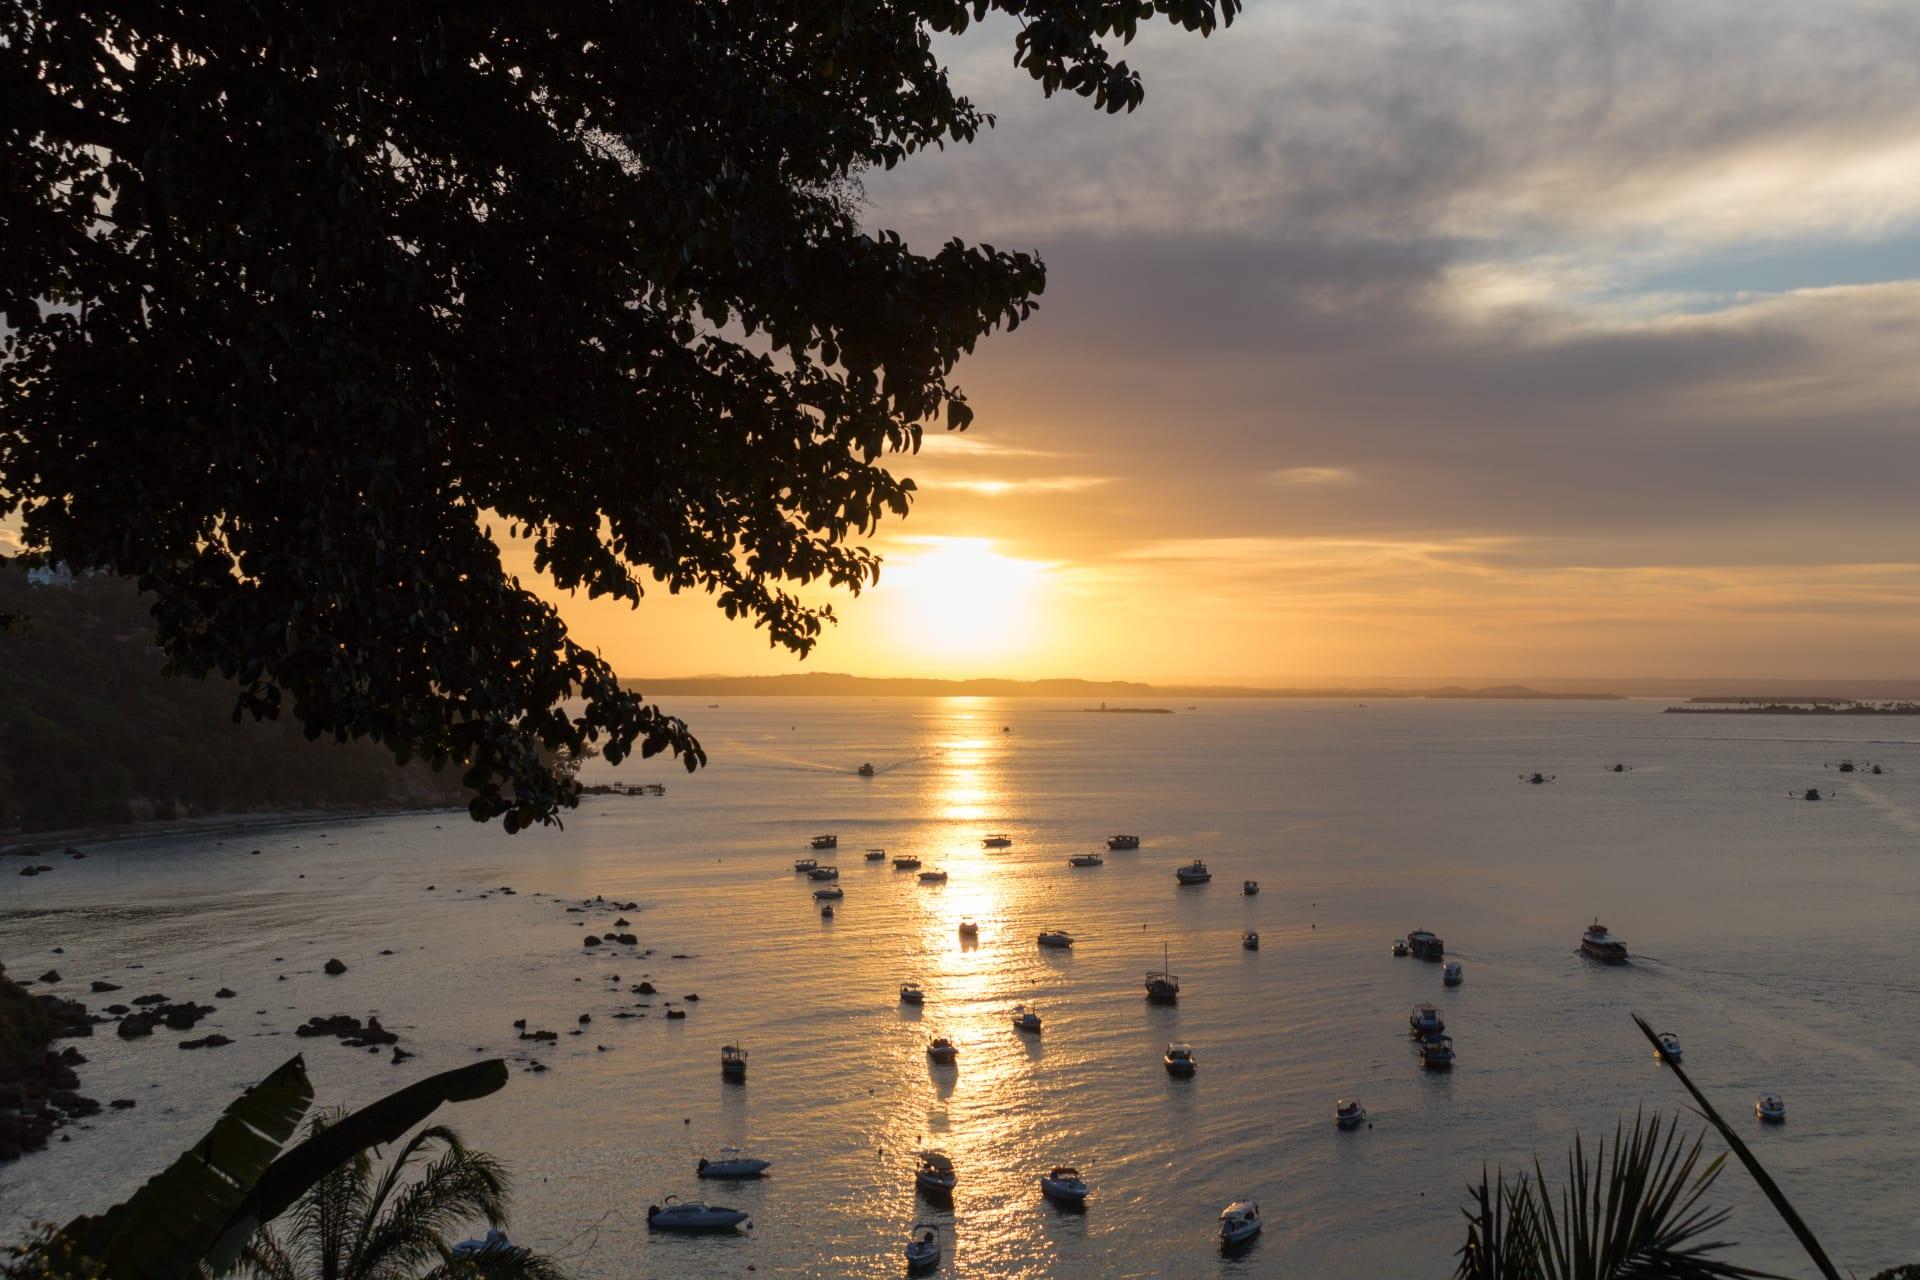 Morro de São Paulo Island - Sunsets in Morro de Sao Paulo - Enjoy the best of Bahia, Brazil